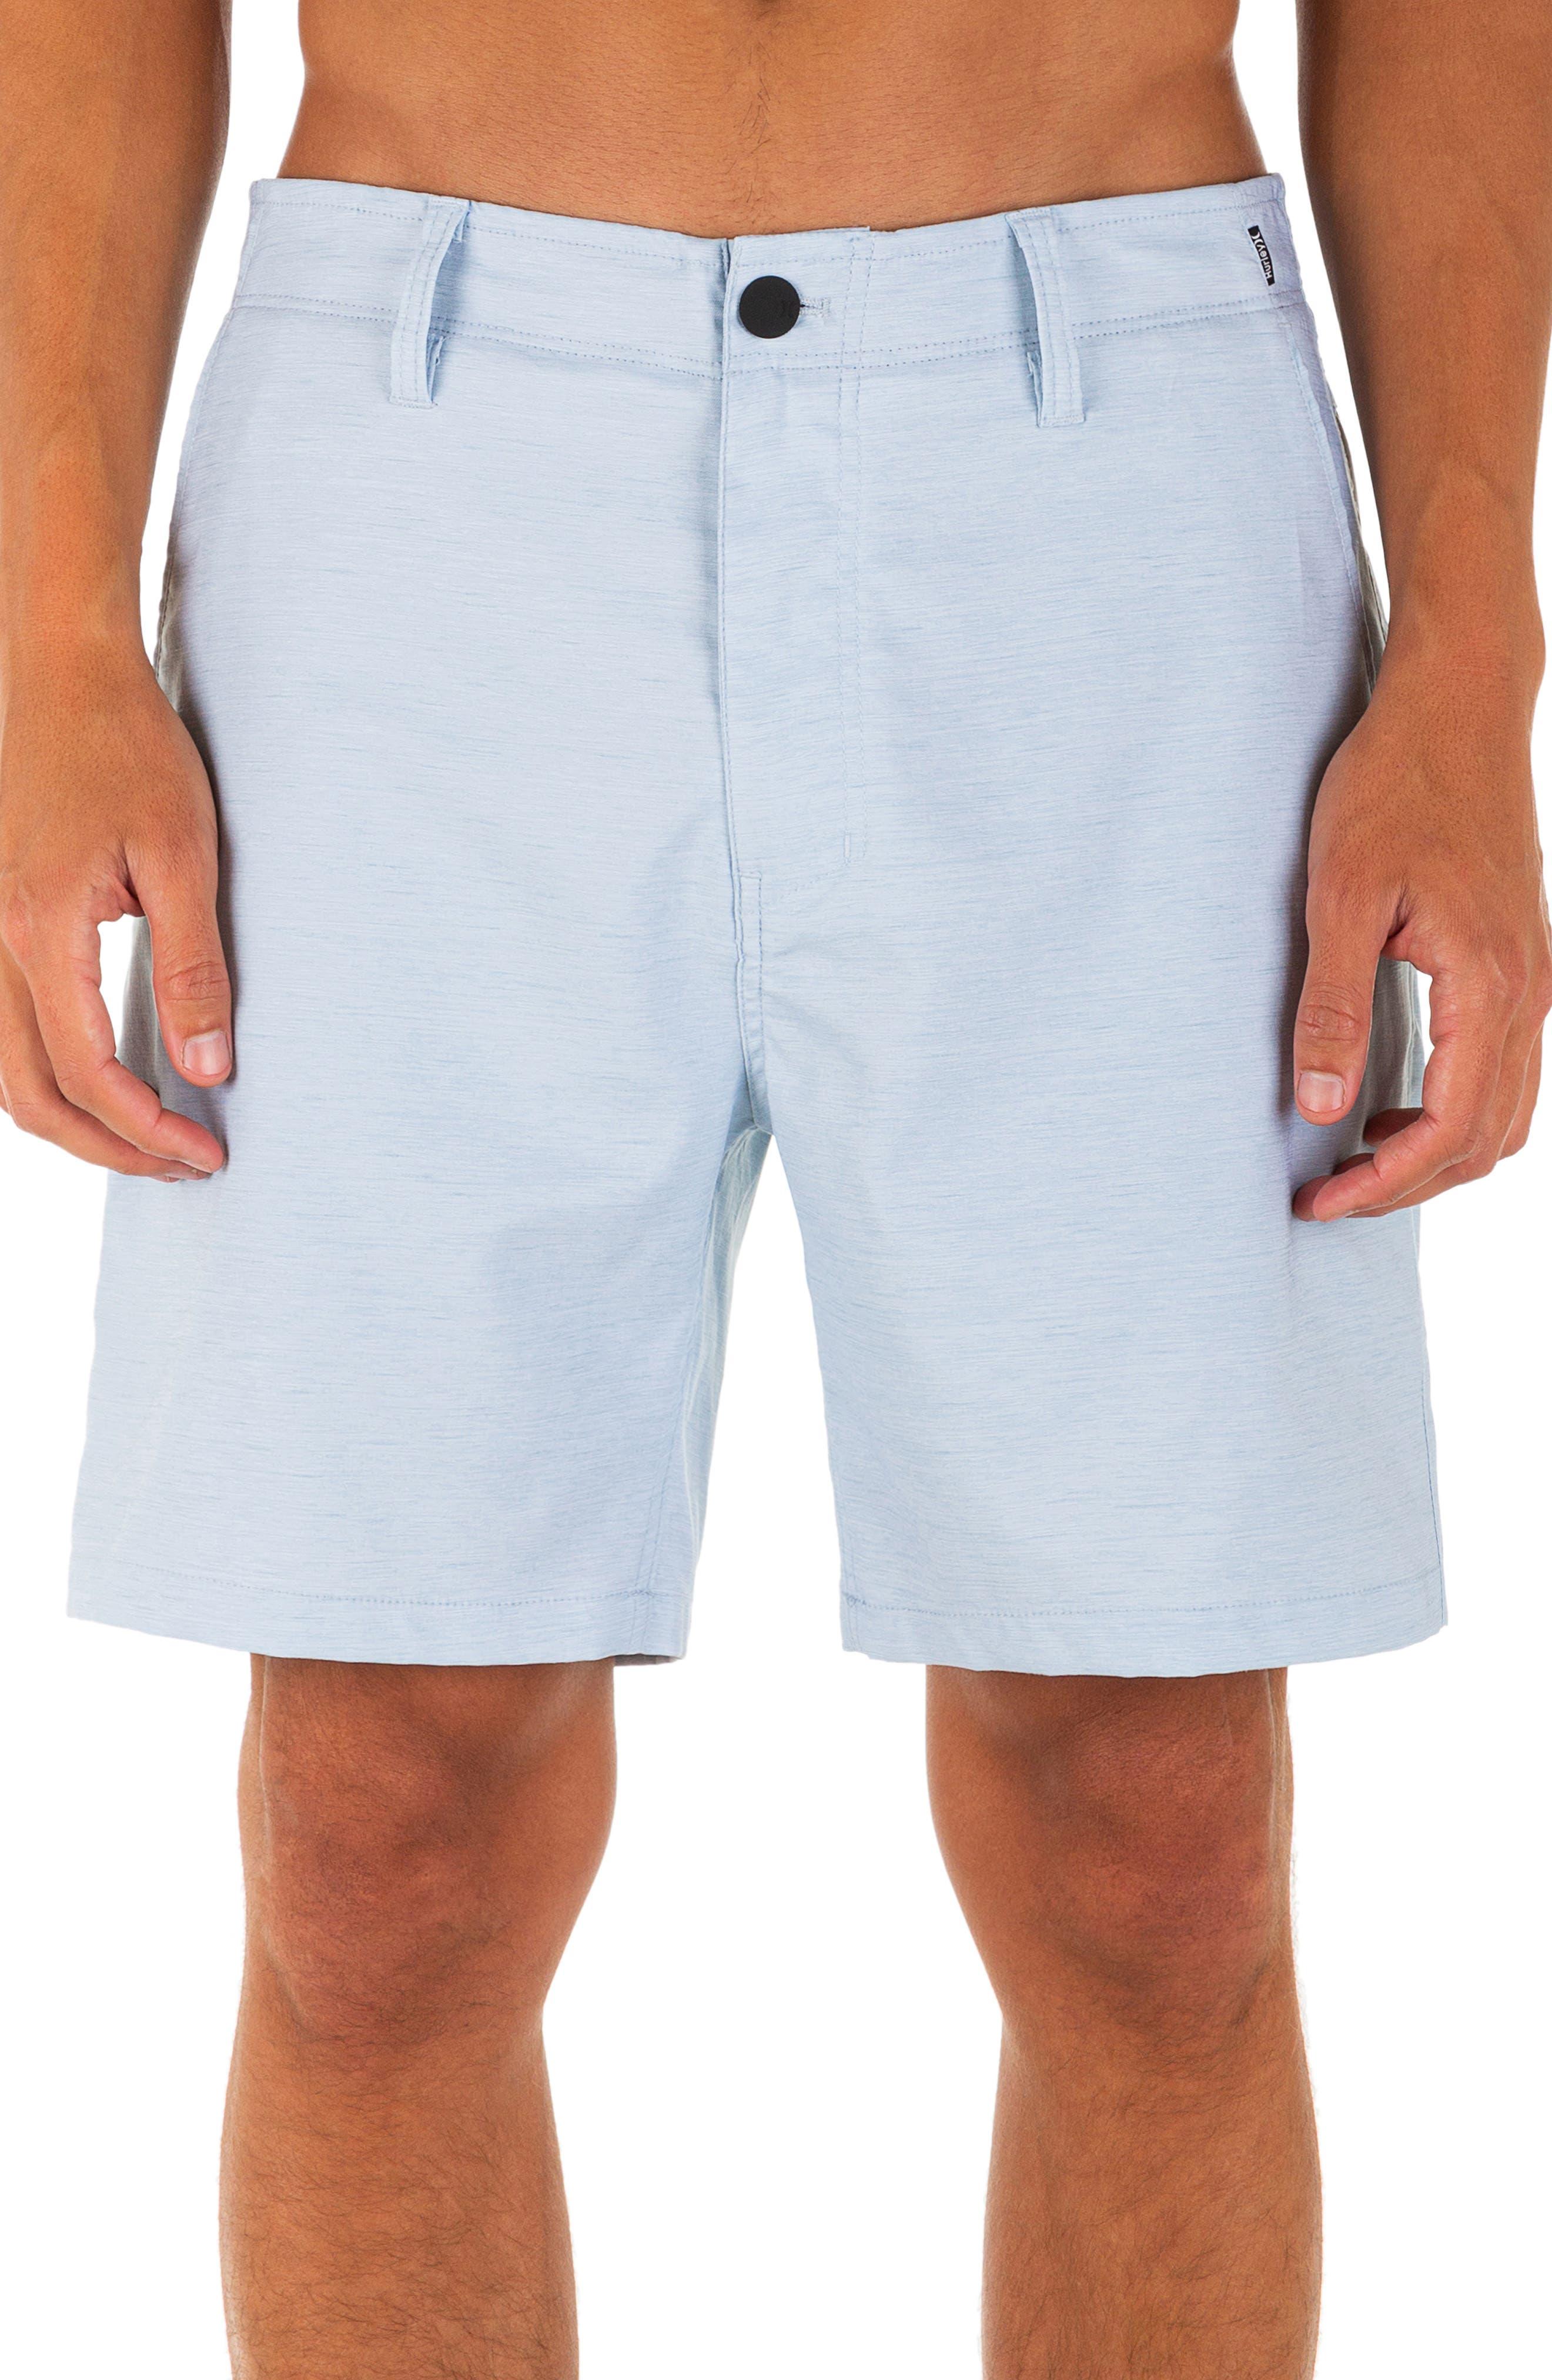 H2O-Dri Marwick Shorts